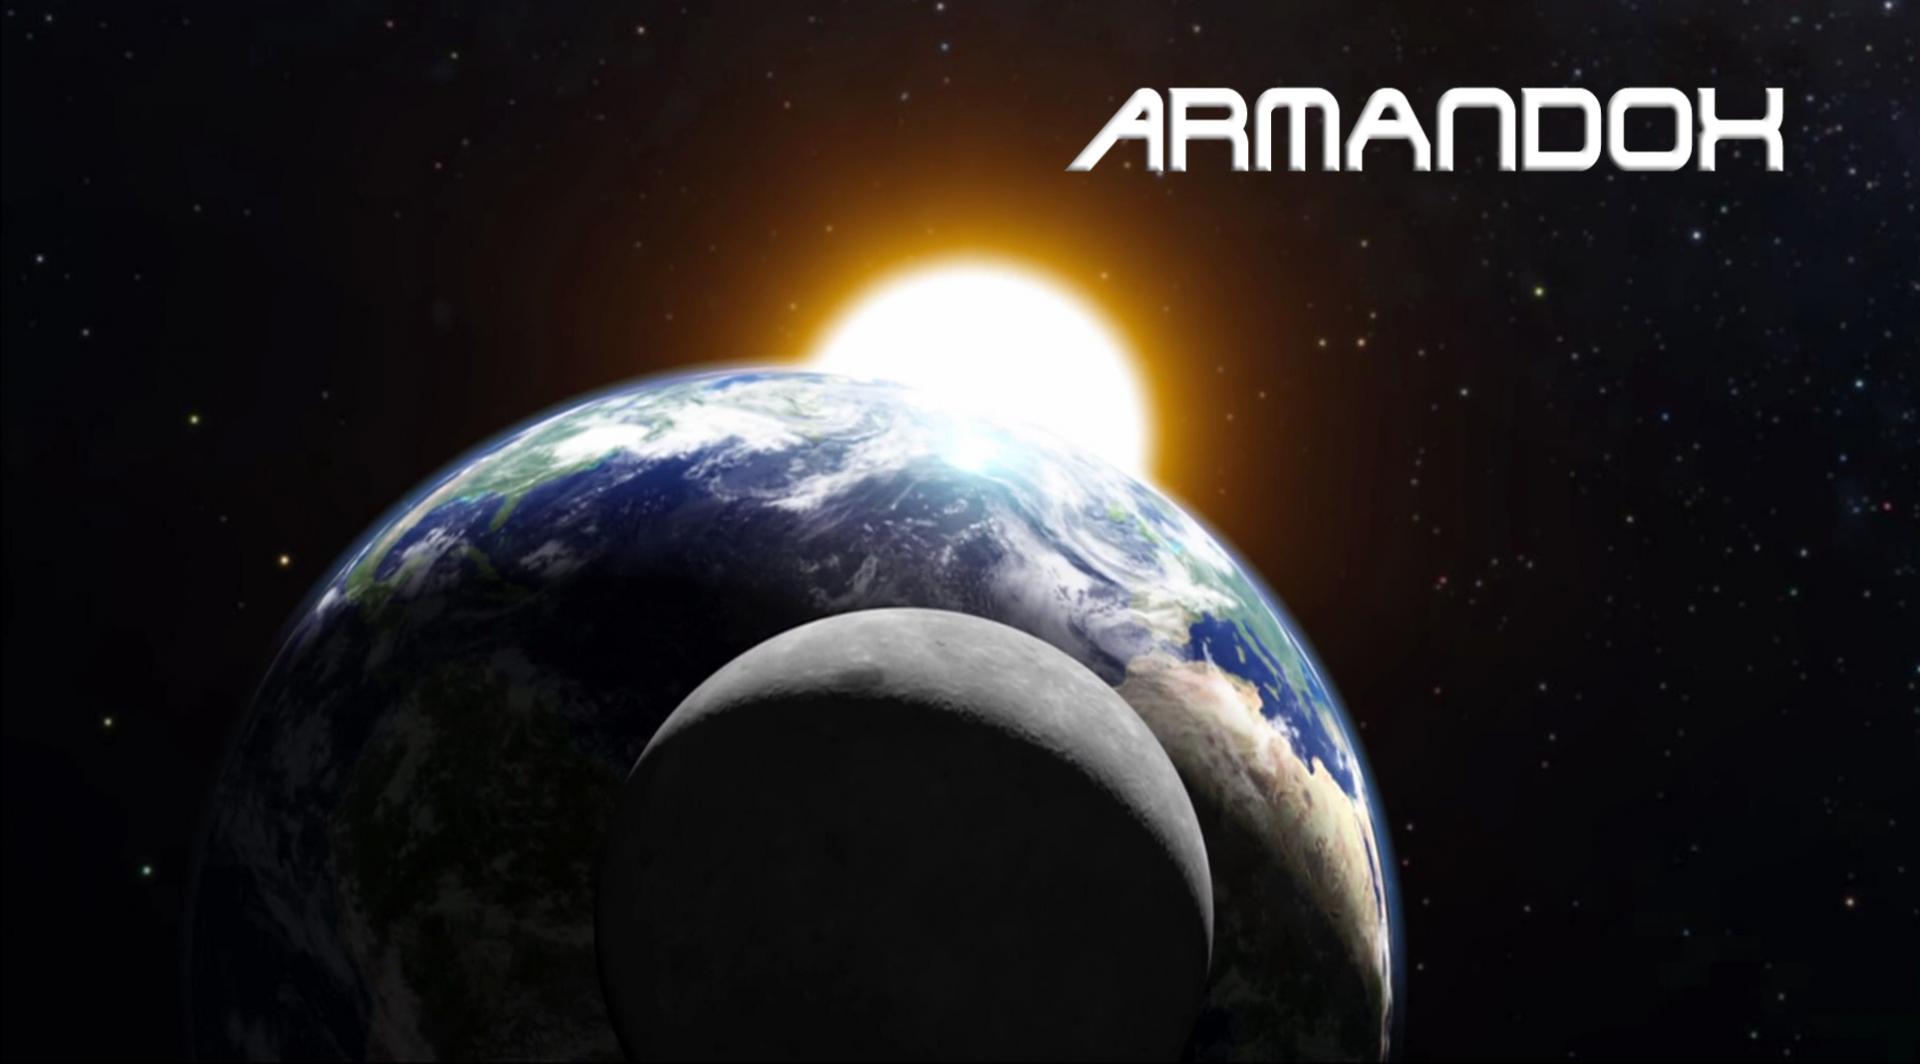 Music by Armandox